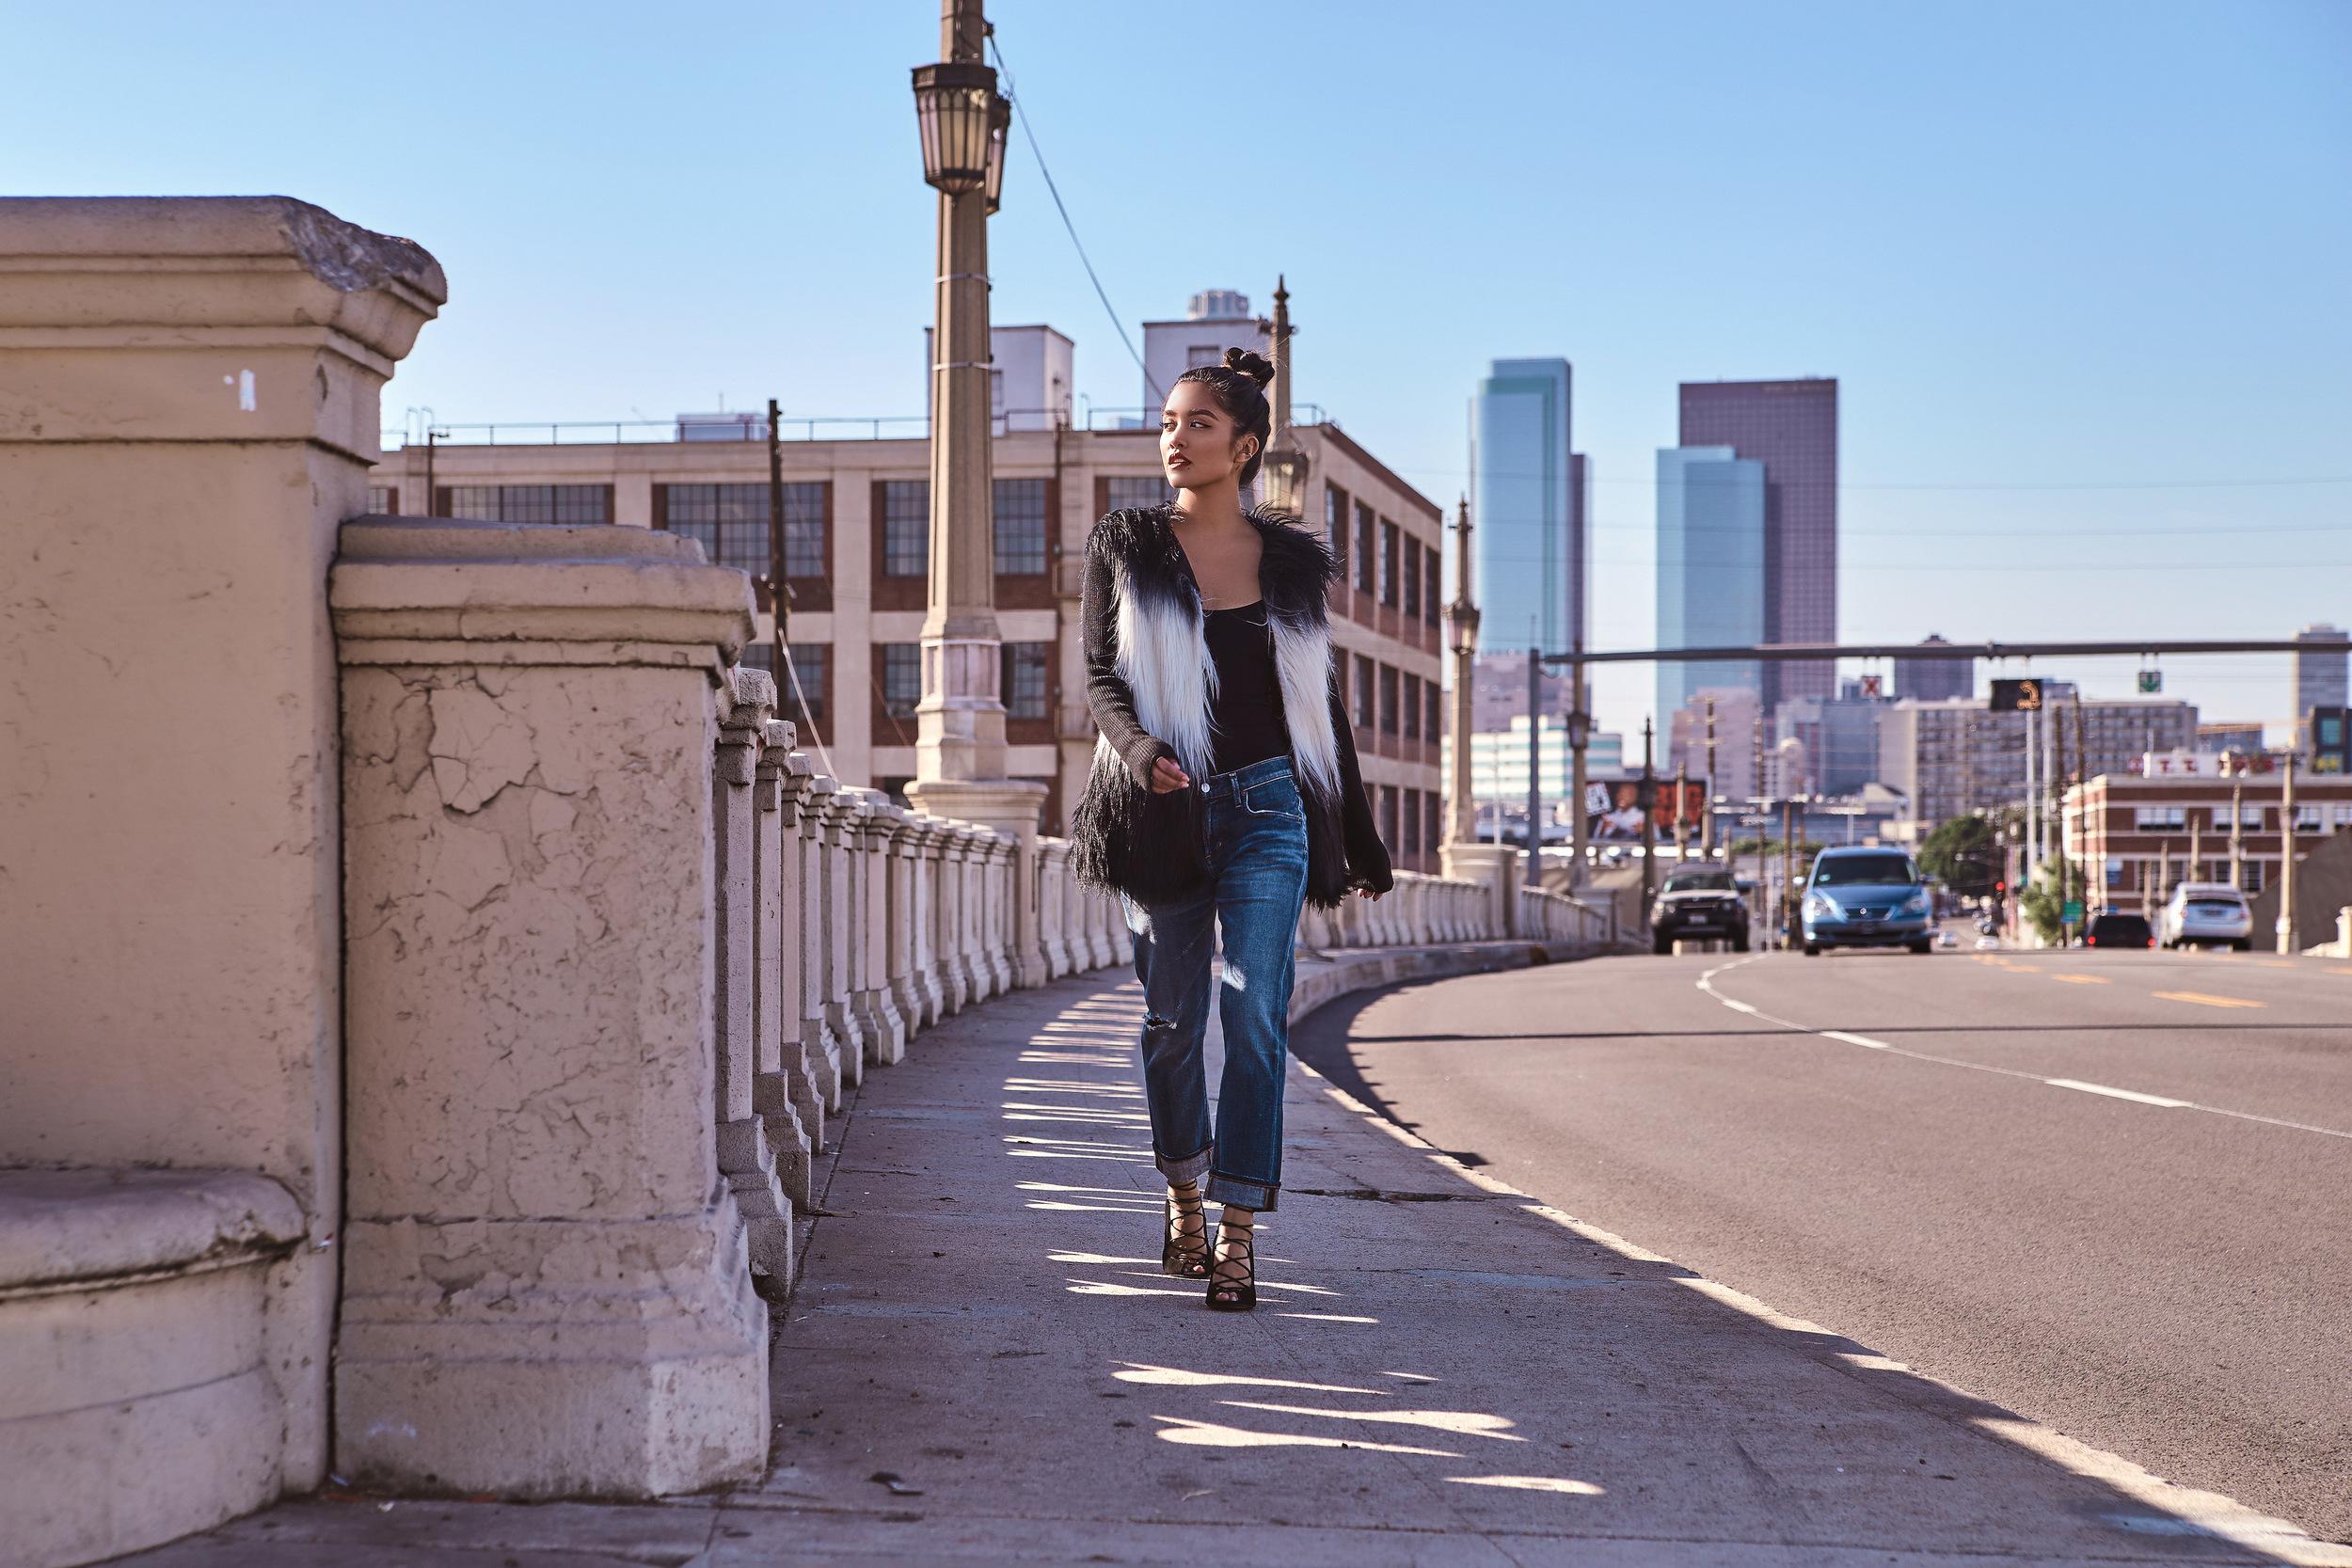 FP body suit   |   A Gold E jeans   |   RAYE heels   |   design history jacket   |   mac lipstick   |    photos by sean martin